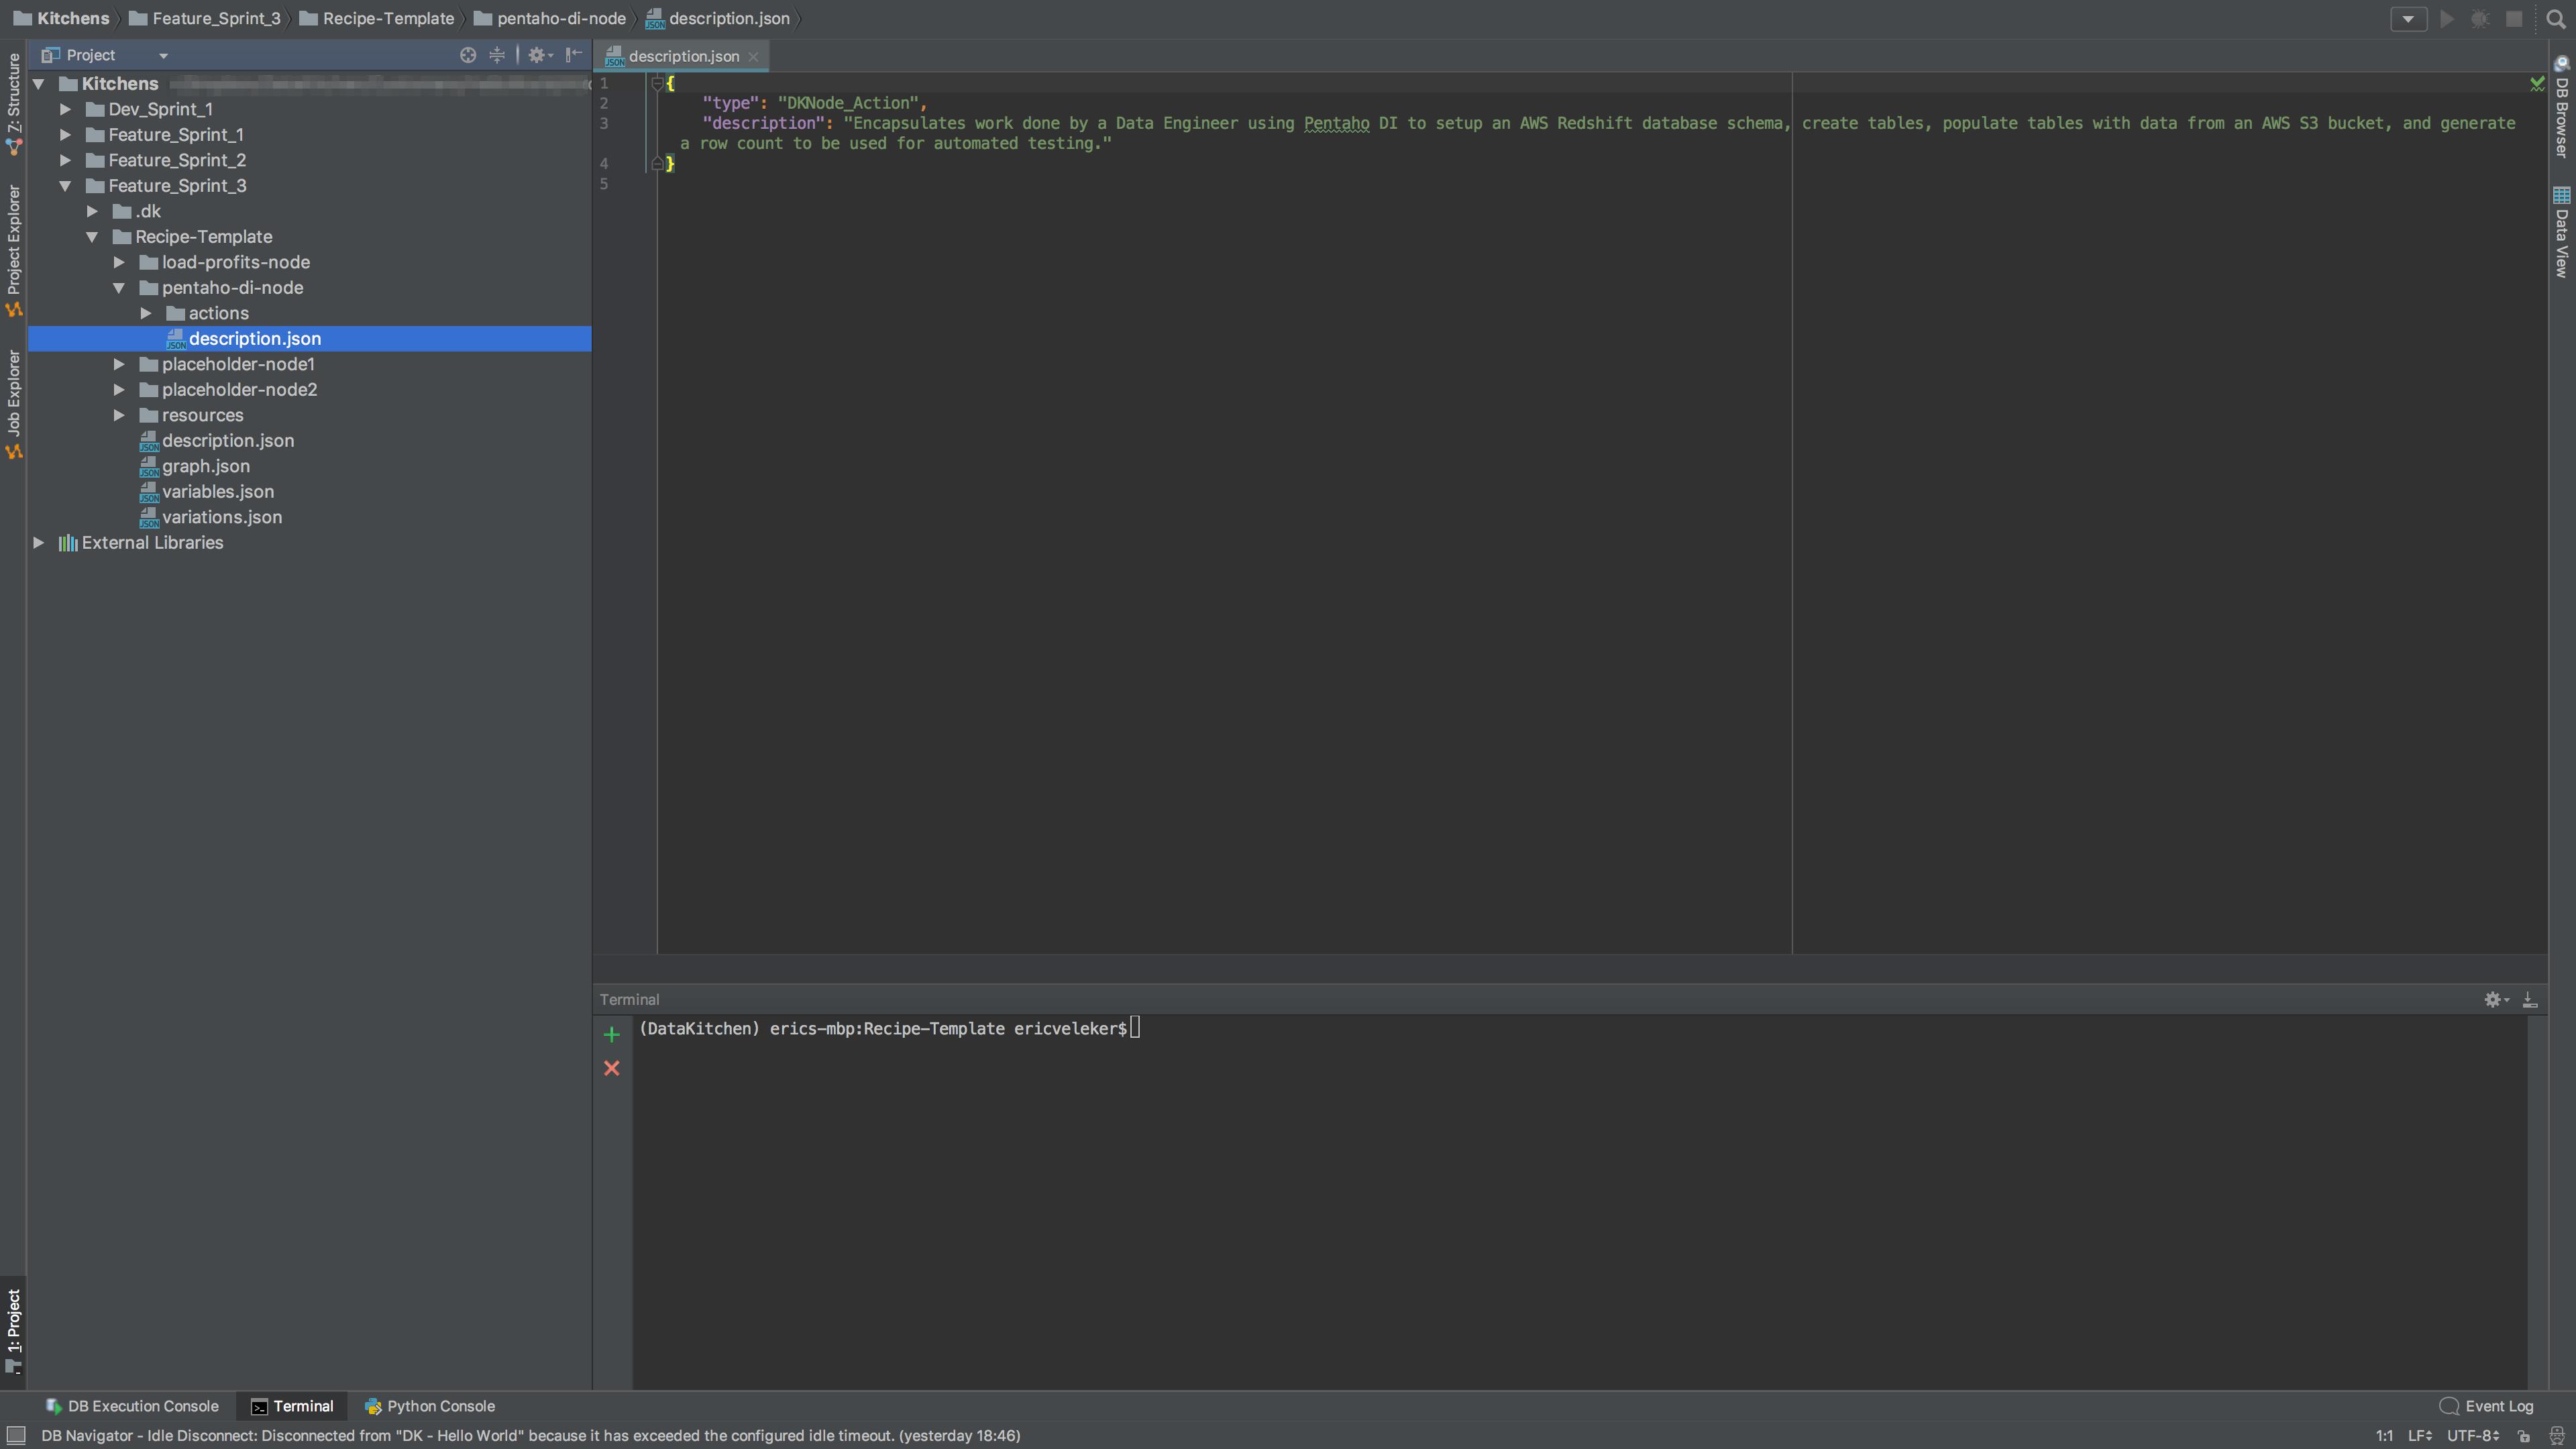 A view of **Recipe-Template**'s **pentaho-di-node**'s **description.json** file.